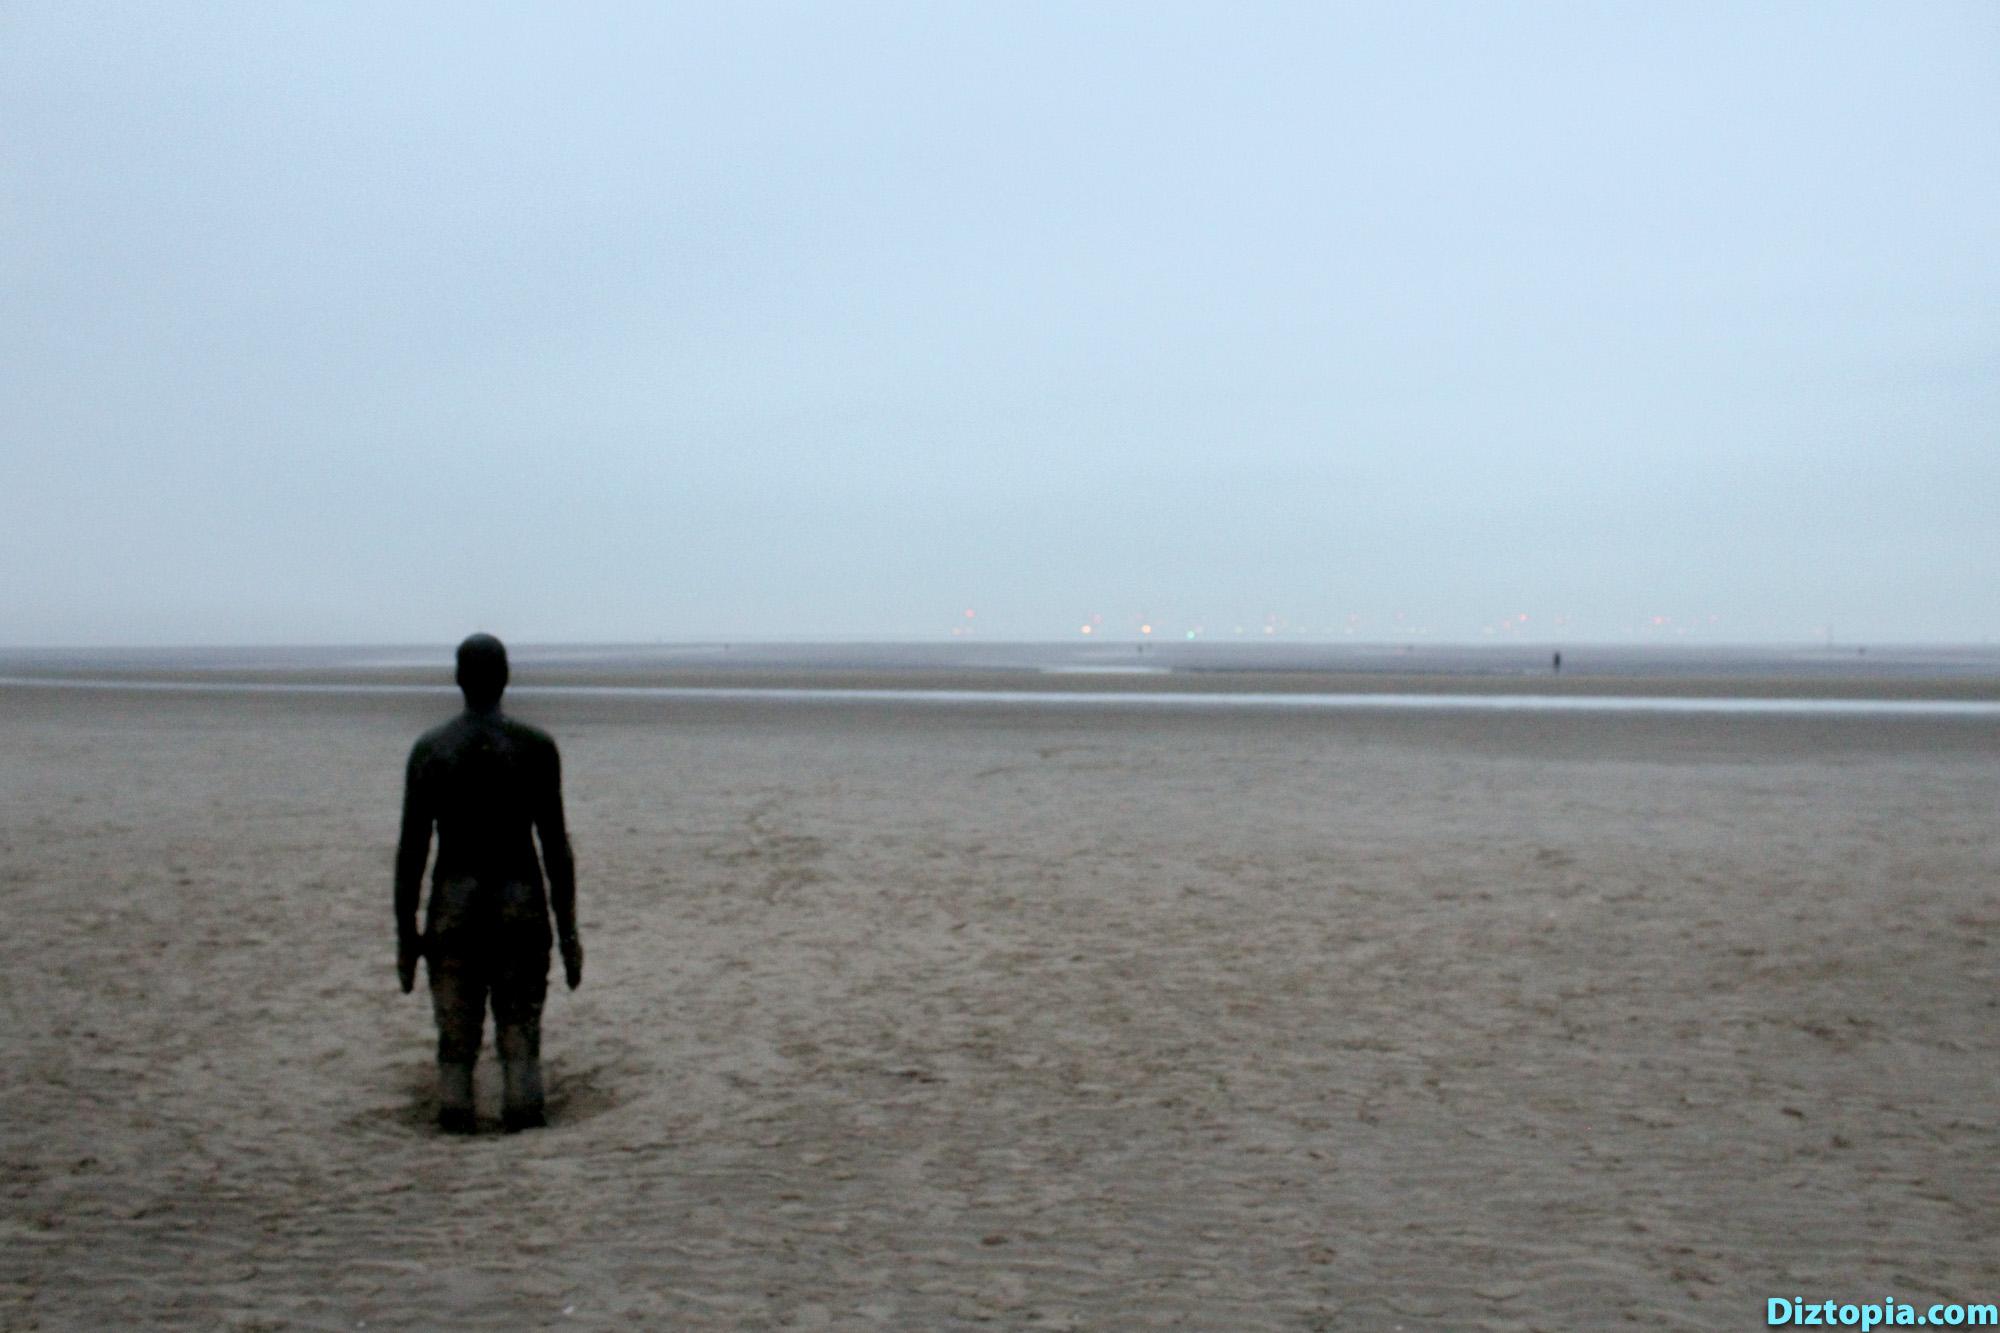 Liverpool-City-UK-Diztopia-Dizma-Dahl-Photography-2017-35-Another-Place-Antony-Gormley-Sculpture-Crosby-Beach-Cast-Iron-Statue-Nature